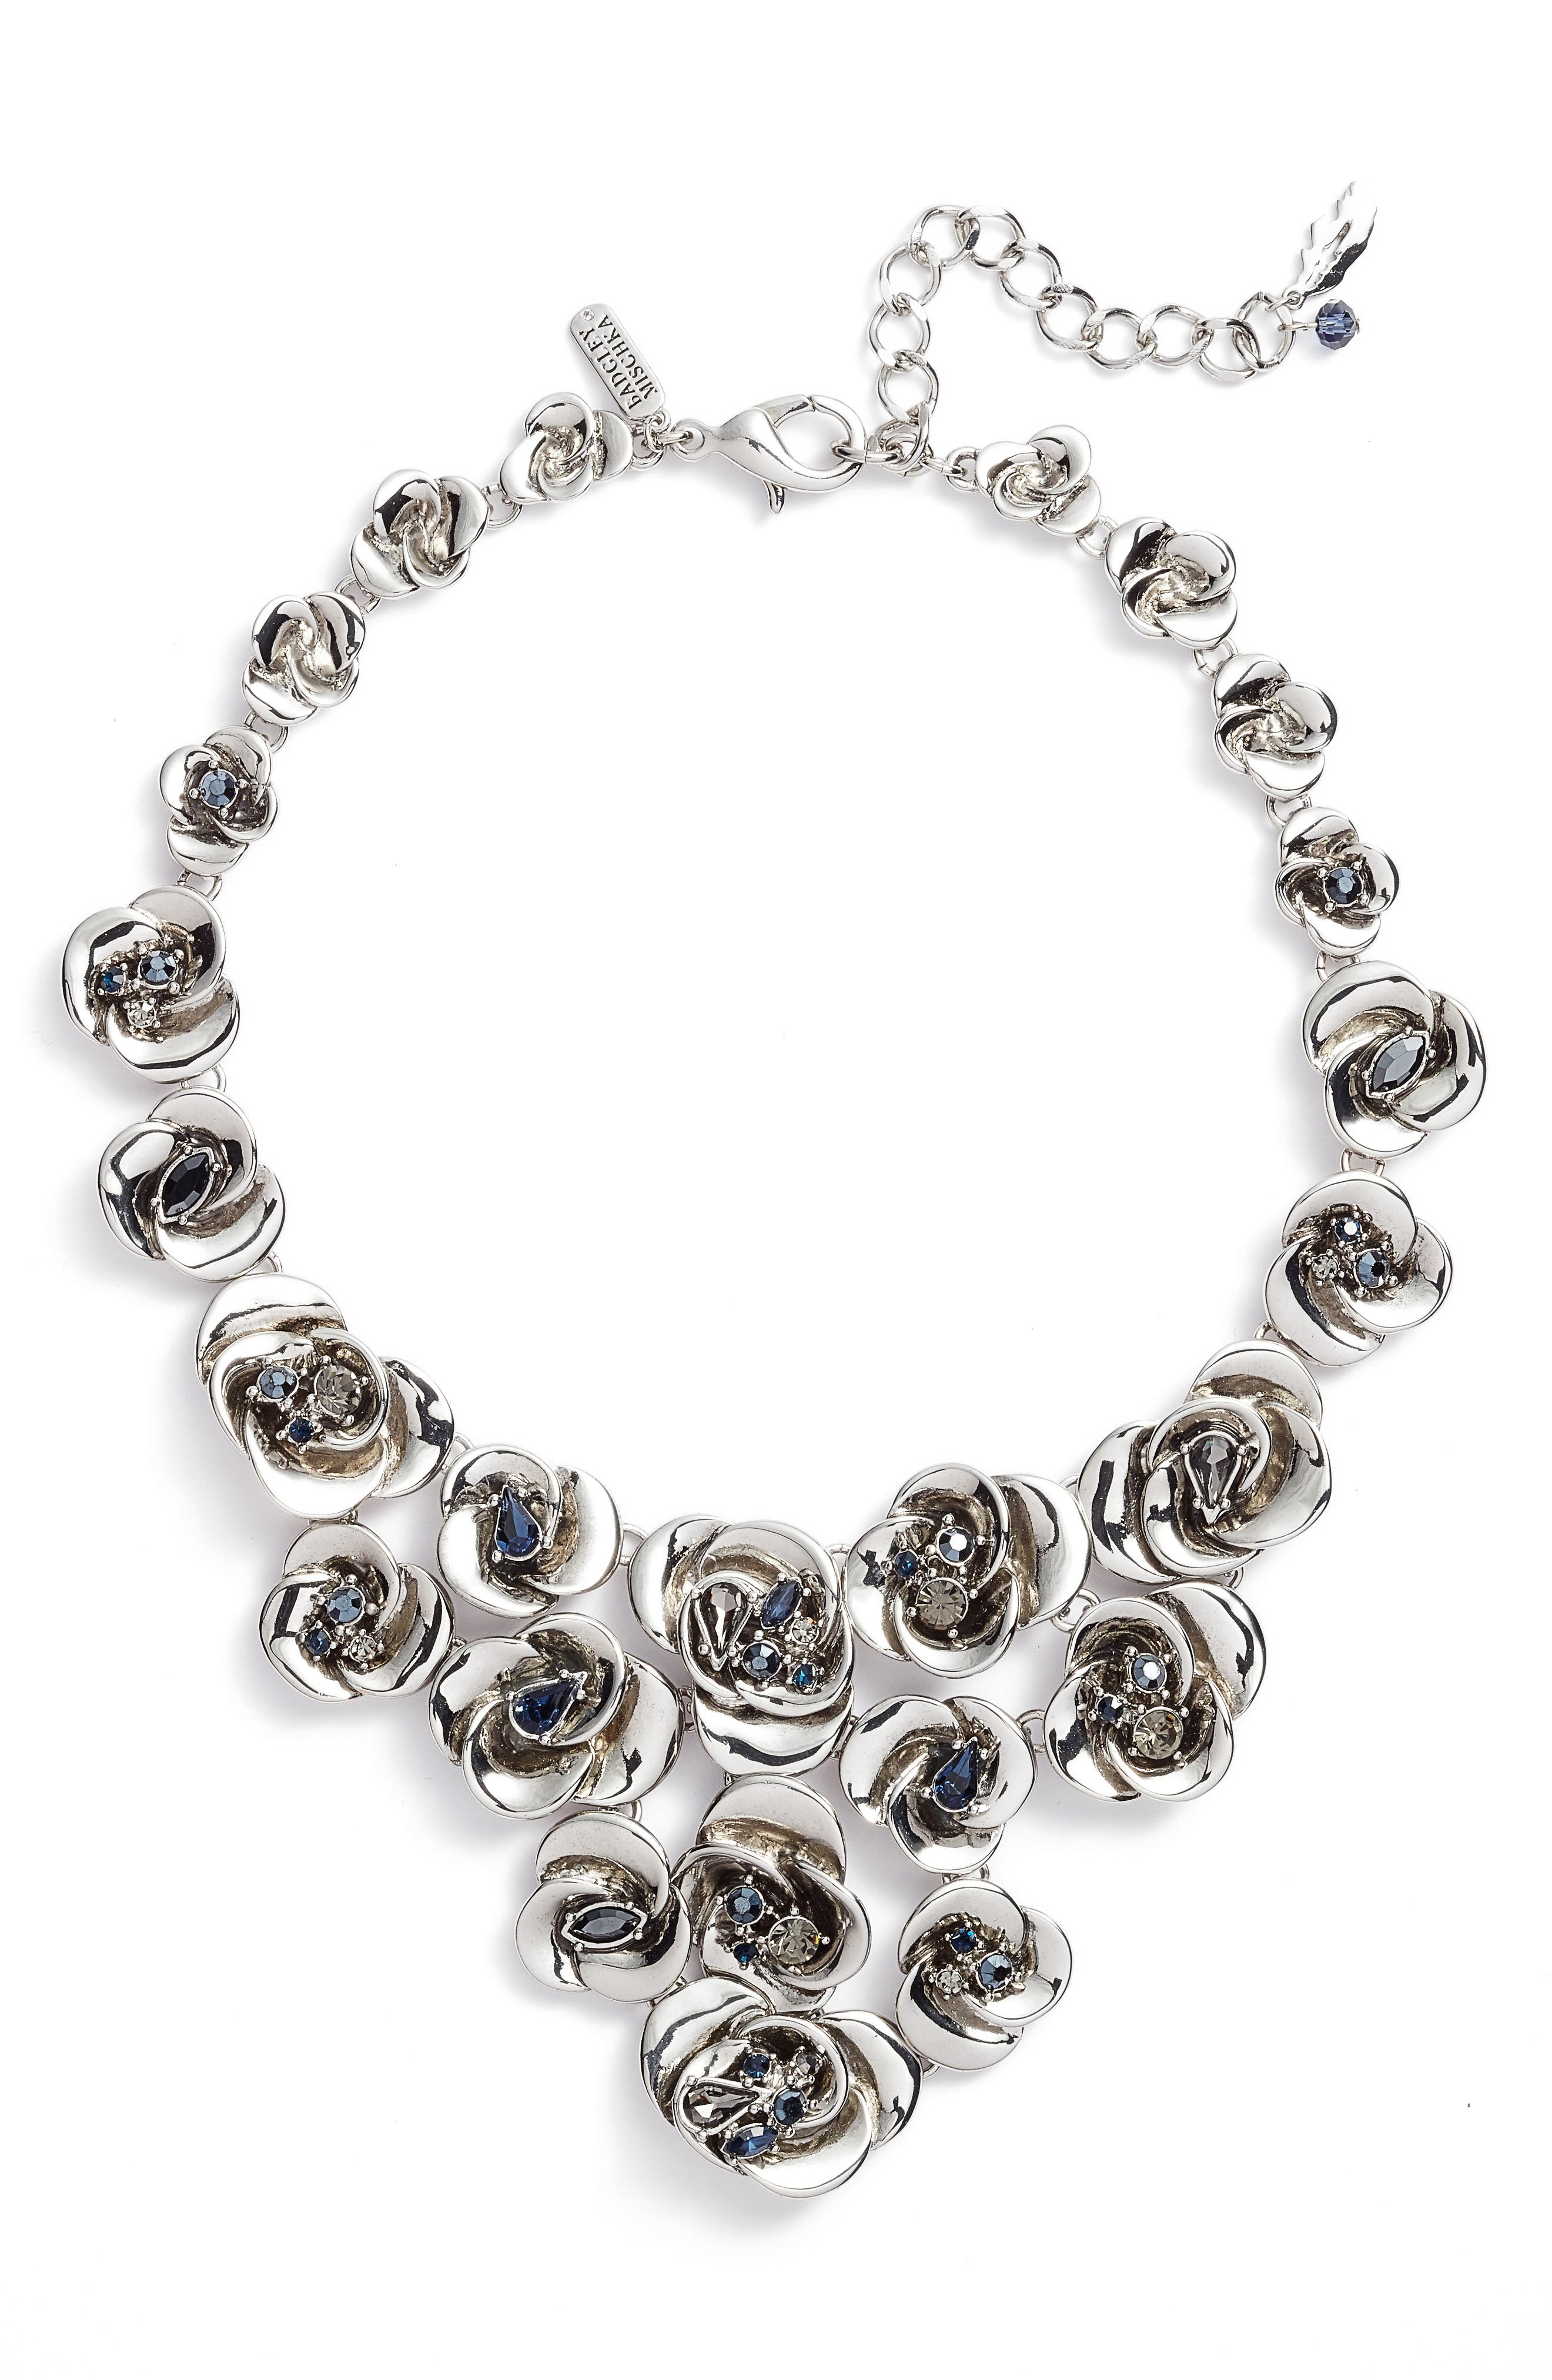 Floral Bib Necklace,                             Main thumbnail 1, color,                             Silver